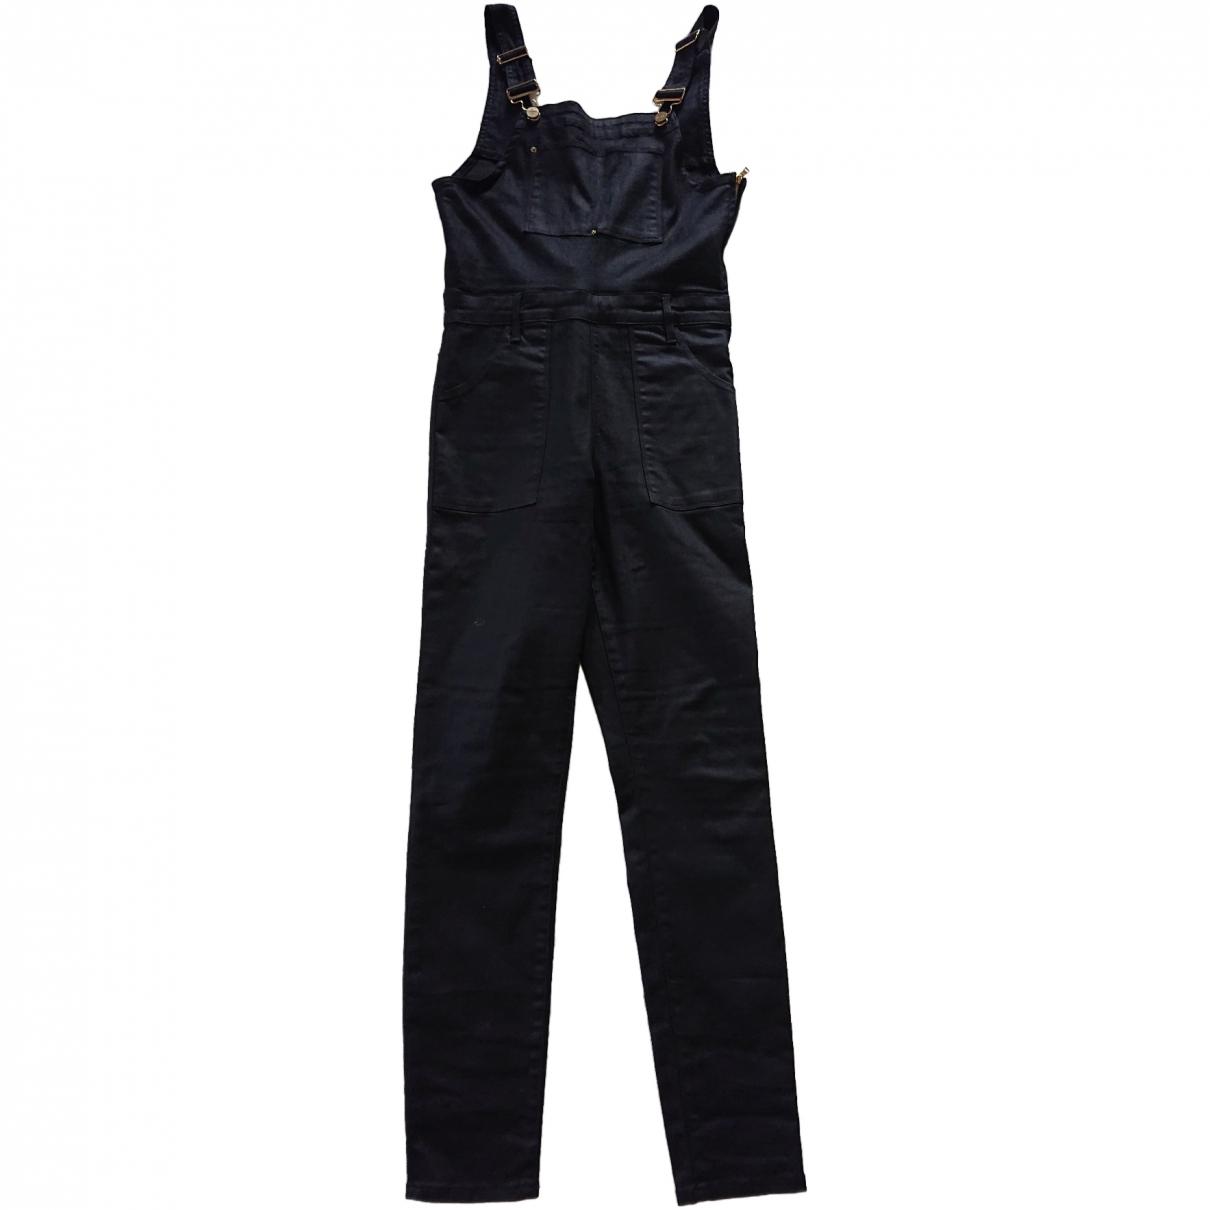 Frame Denim \N Black Cotton jumpsuit for Women M International